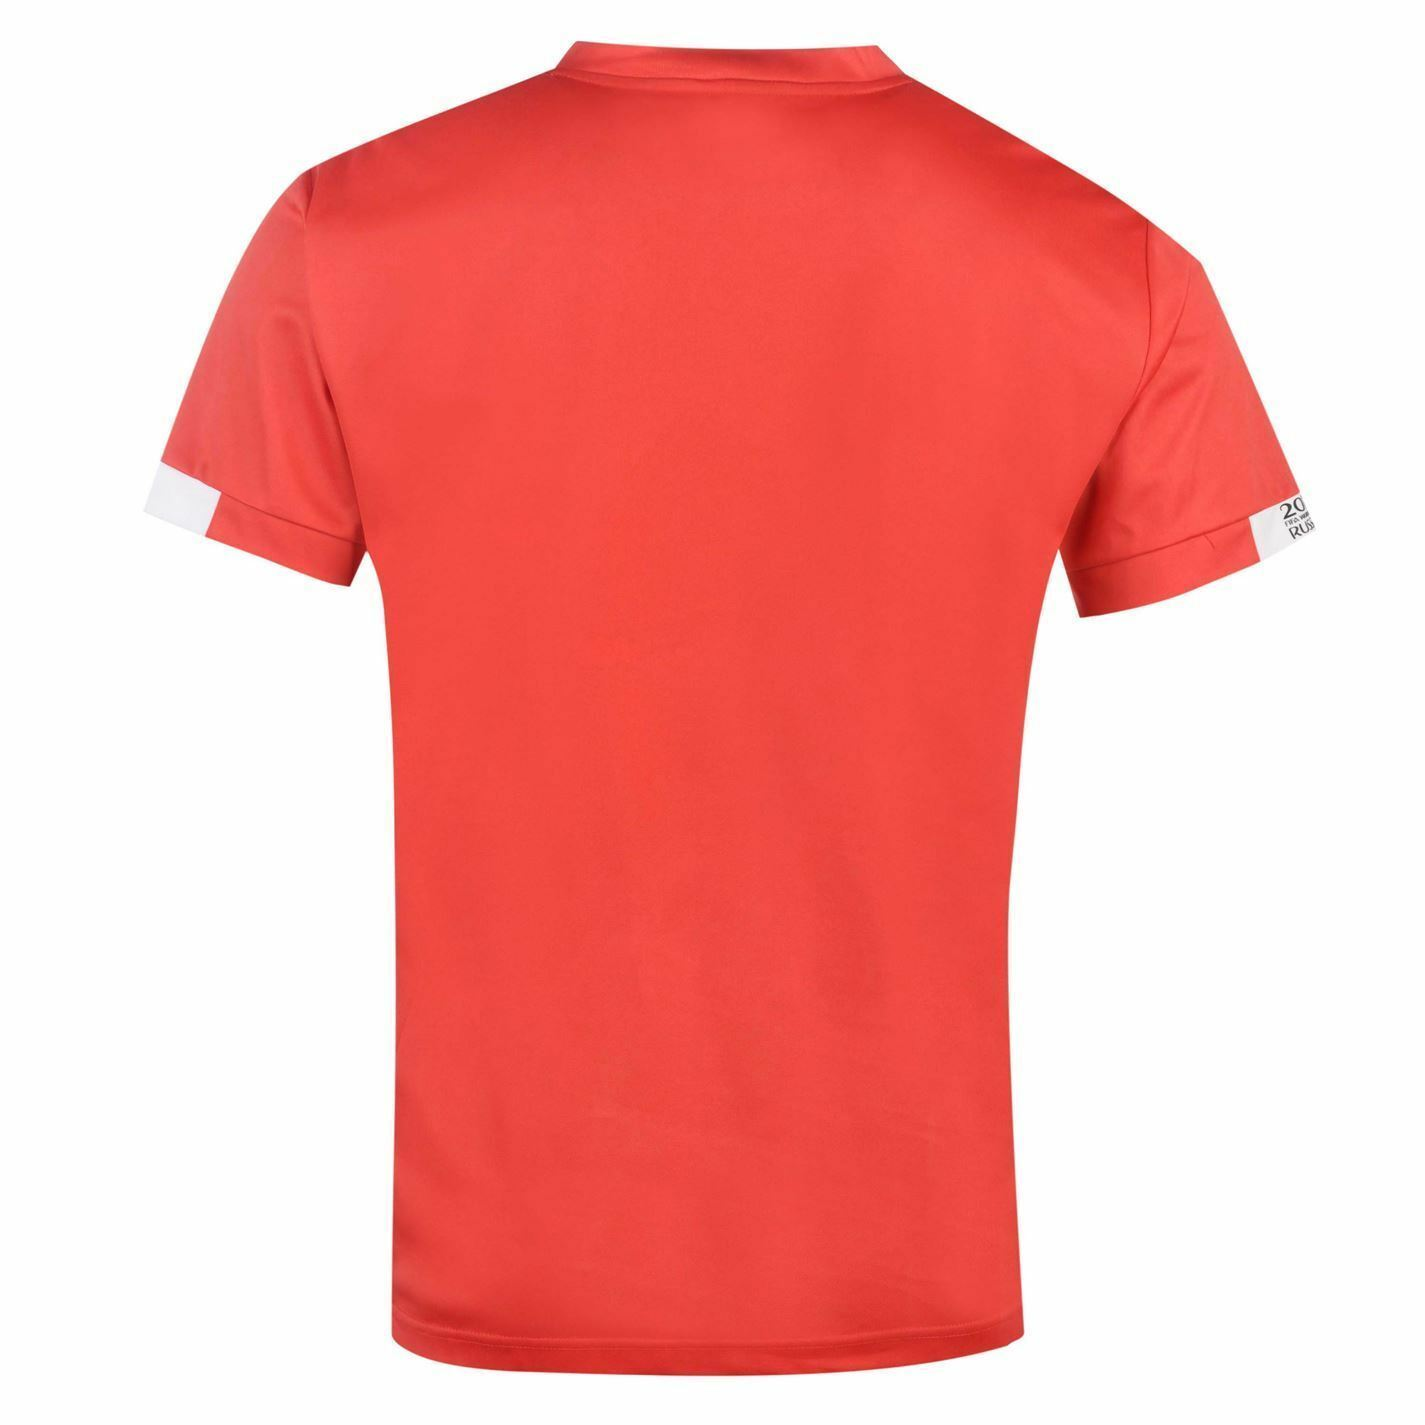 miniature 3 - FIFA Coupe du monde 2018 Angleterre T-Shirt Homme Football Soccer tee shirt top